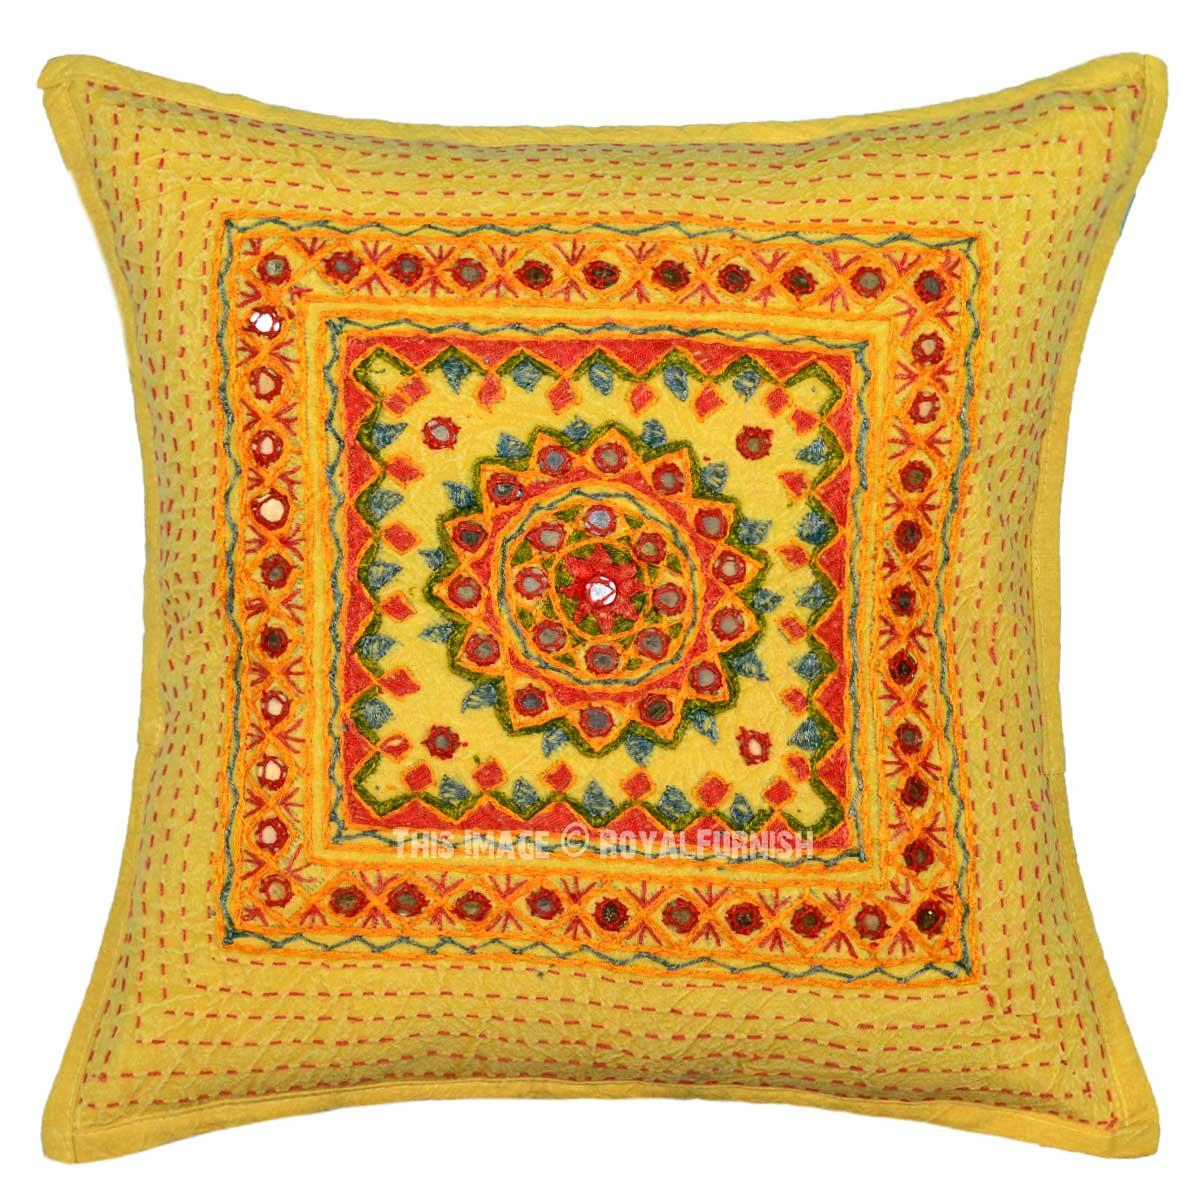 Yellow Decorative Throw Pillows : Yellow Mirror Medallion Circle 16X16 Decorative Throw Pillow Cover 16X16 - RoyalFurnish.com